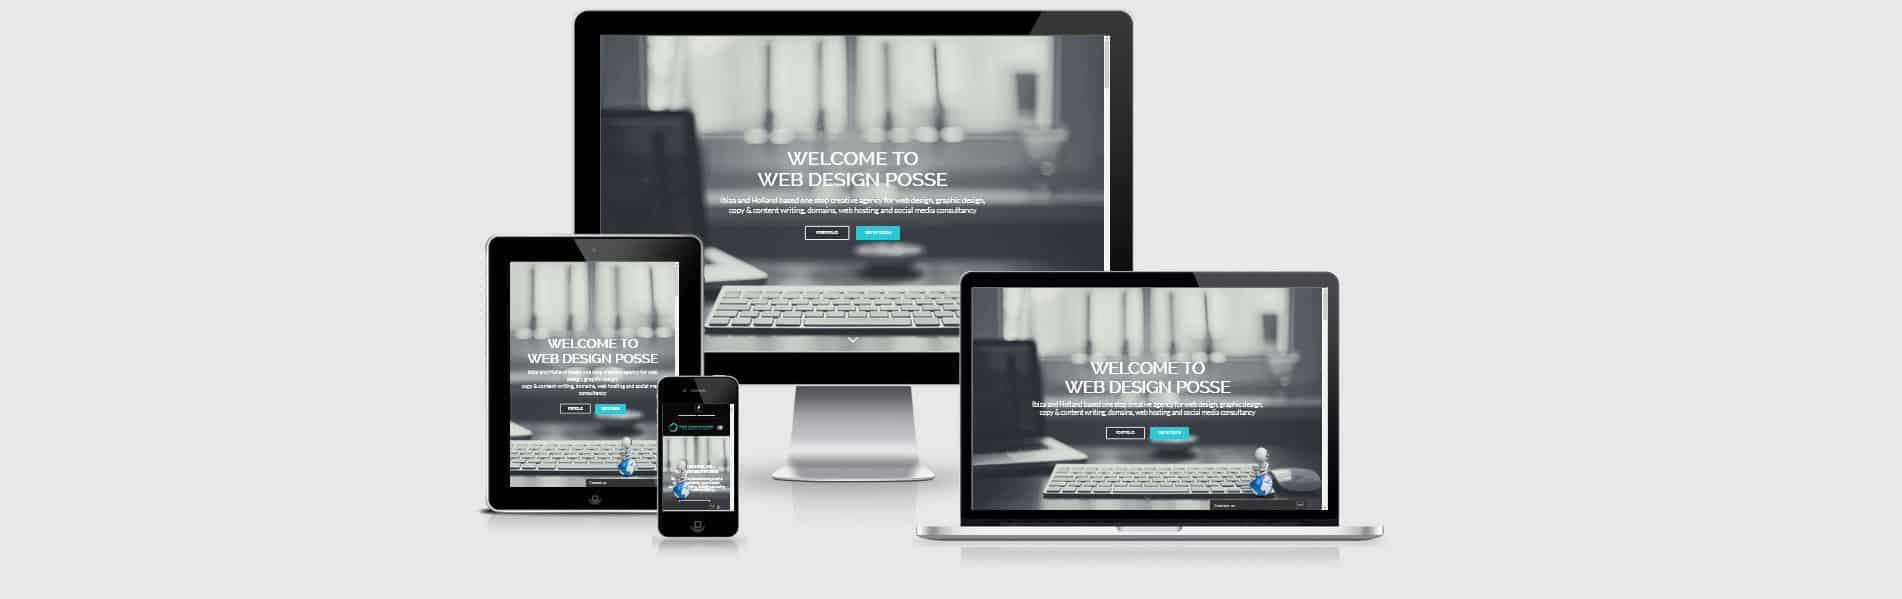 Responsive web design Ibiza and Holland